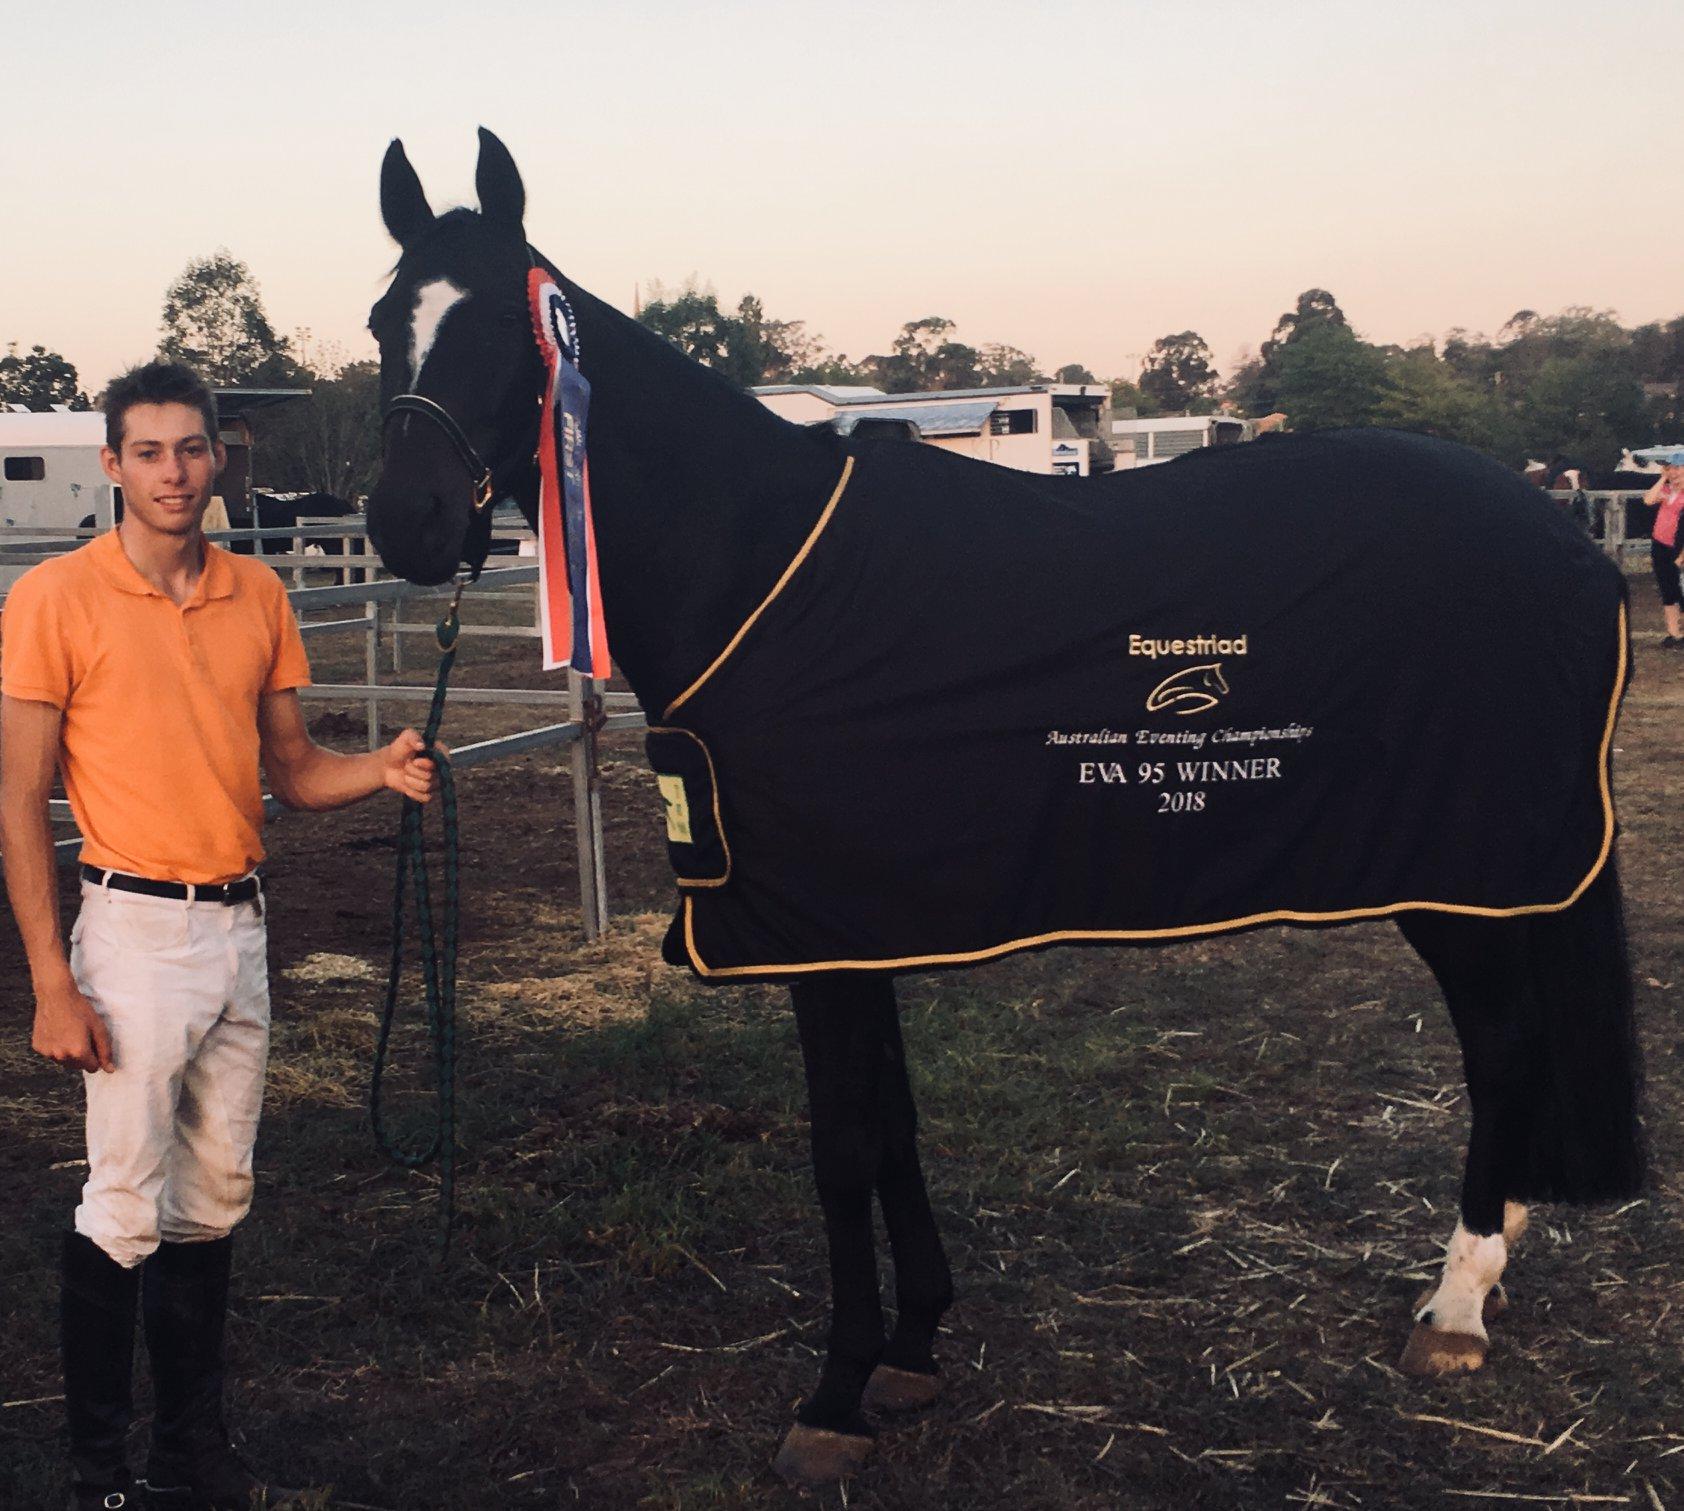 AUS Champs 2018 - Sam and Woodmount Lolita